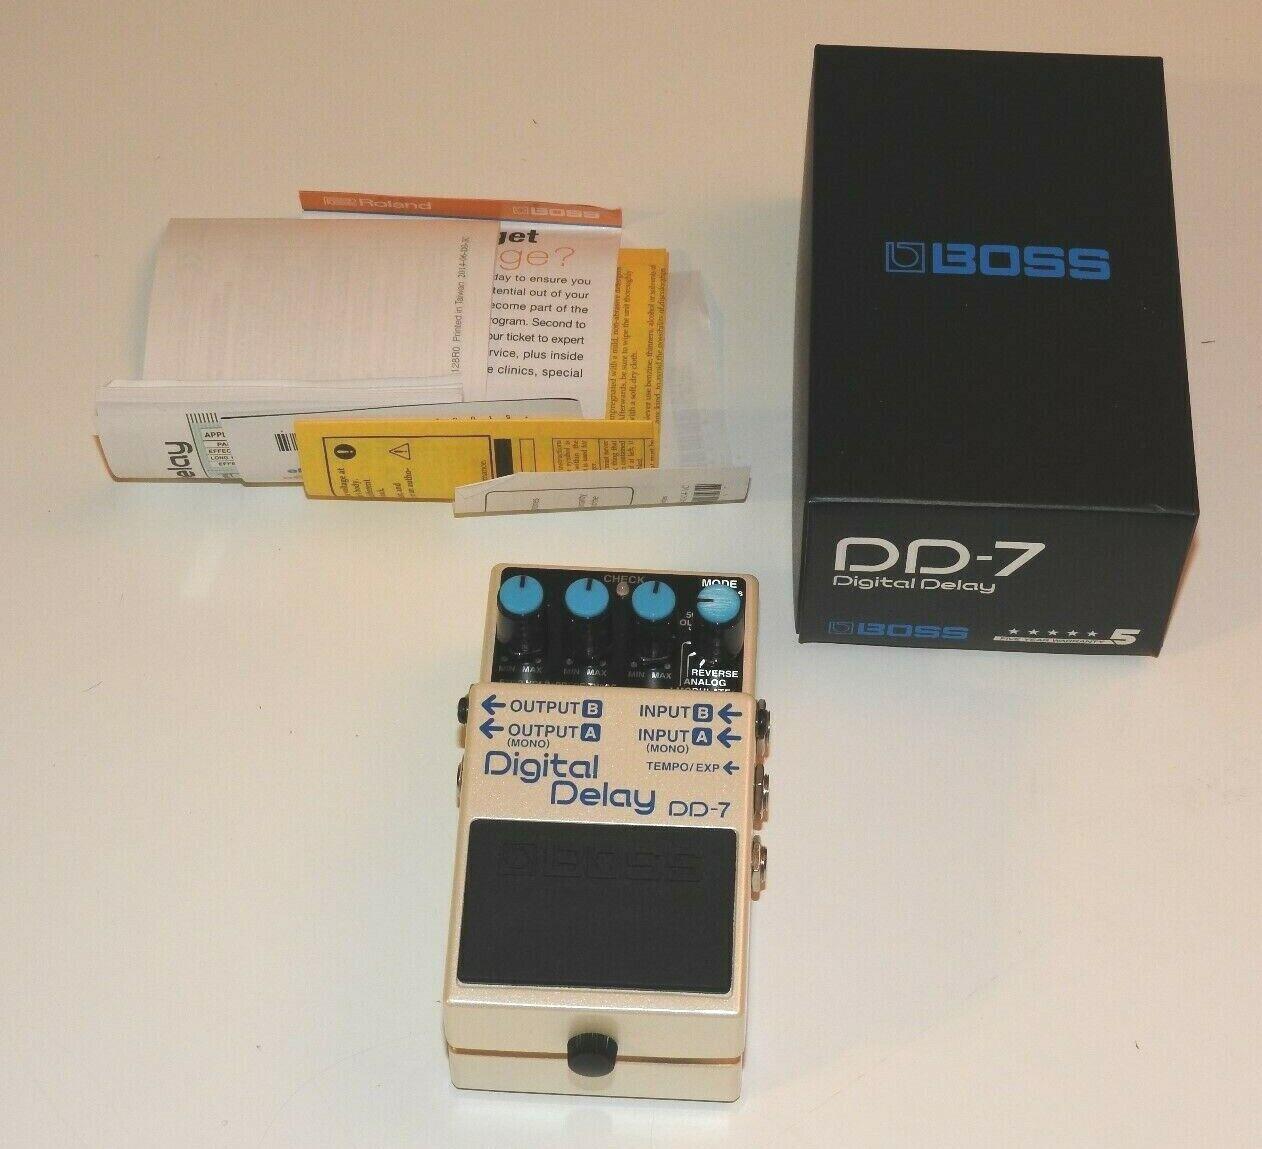 NEW  BOSS DD-7 DIGITAL DELAY EFFECTS PEDAL STEREO ELECTRIC GUITAR DD7